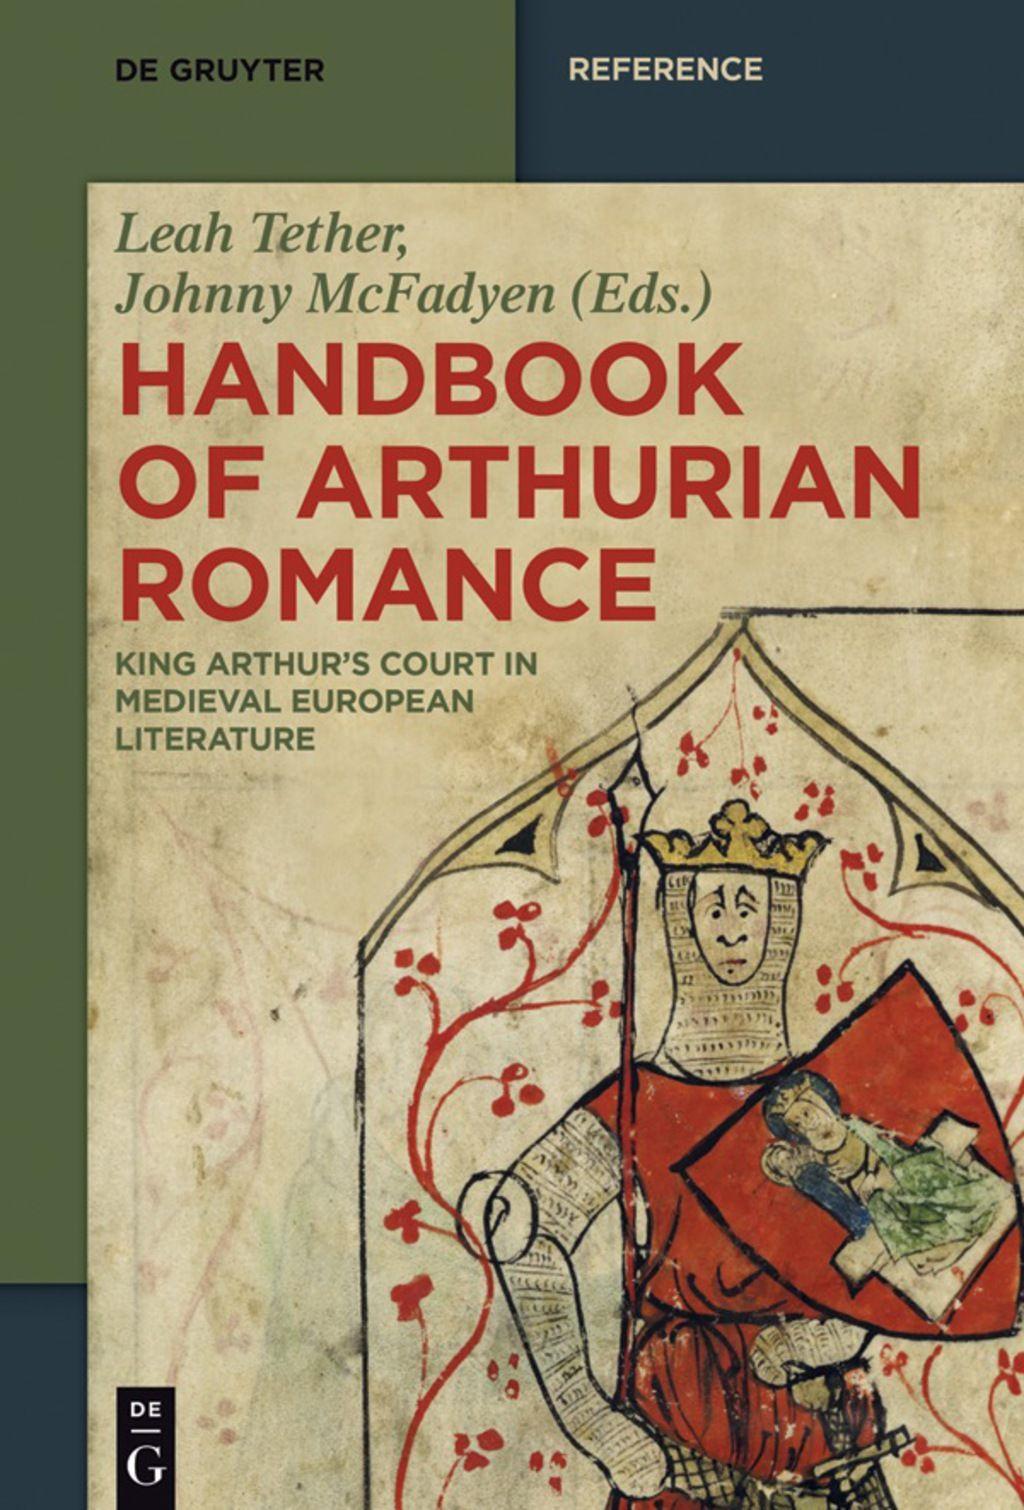 Handbook of arthurian romance ebook with images